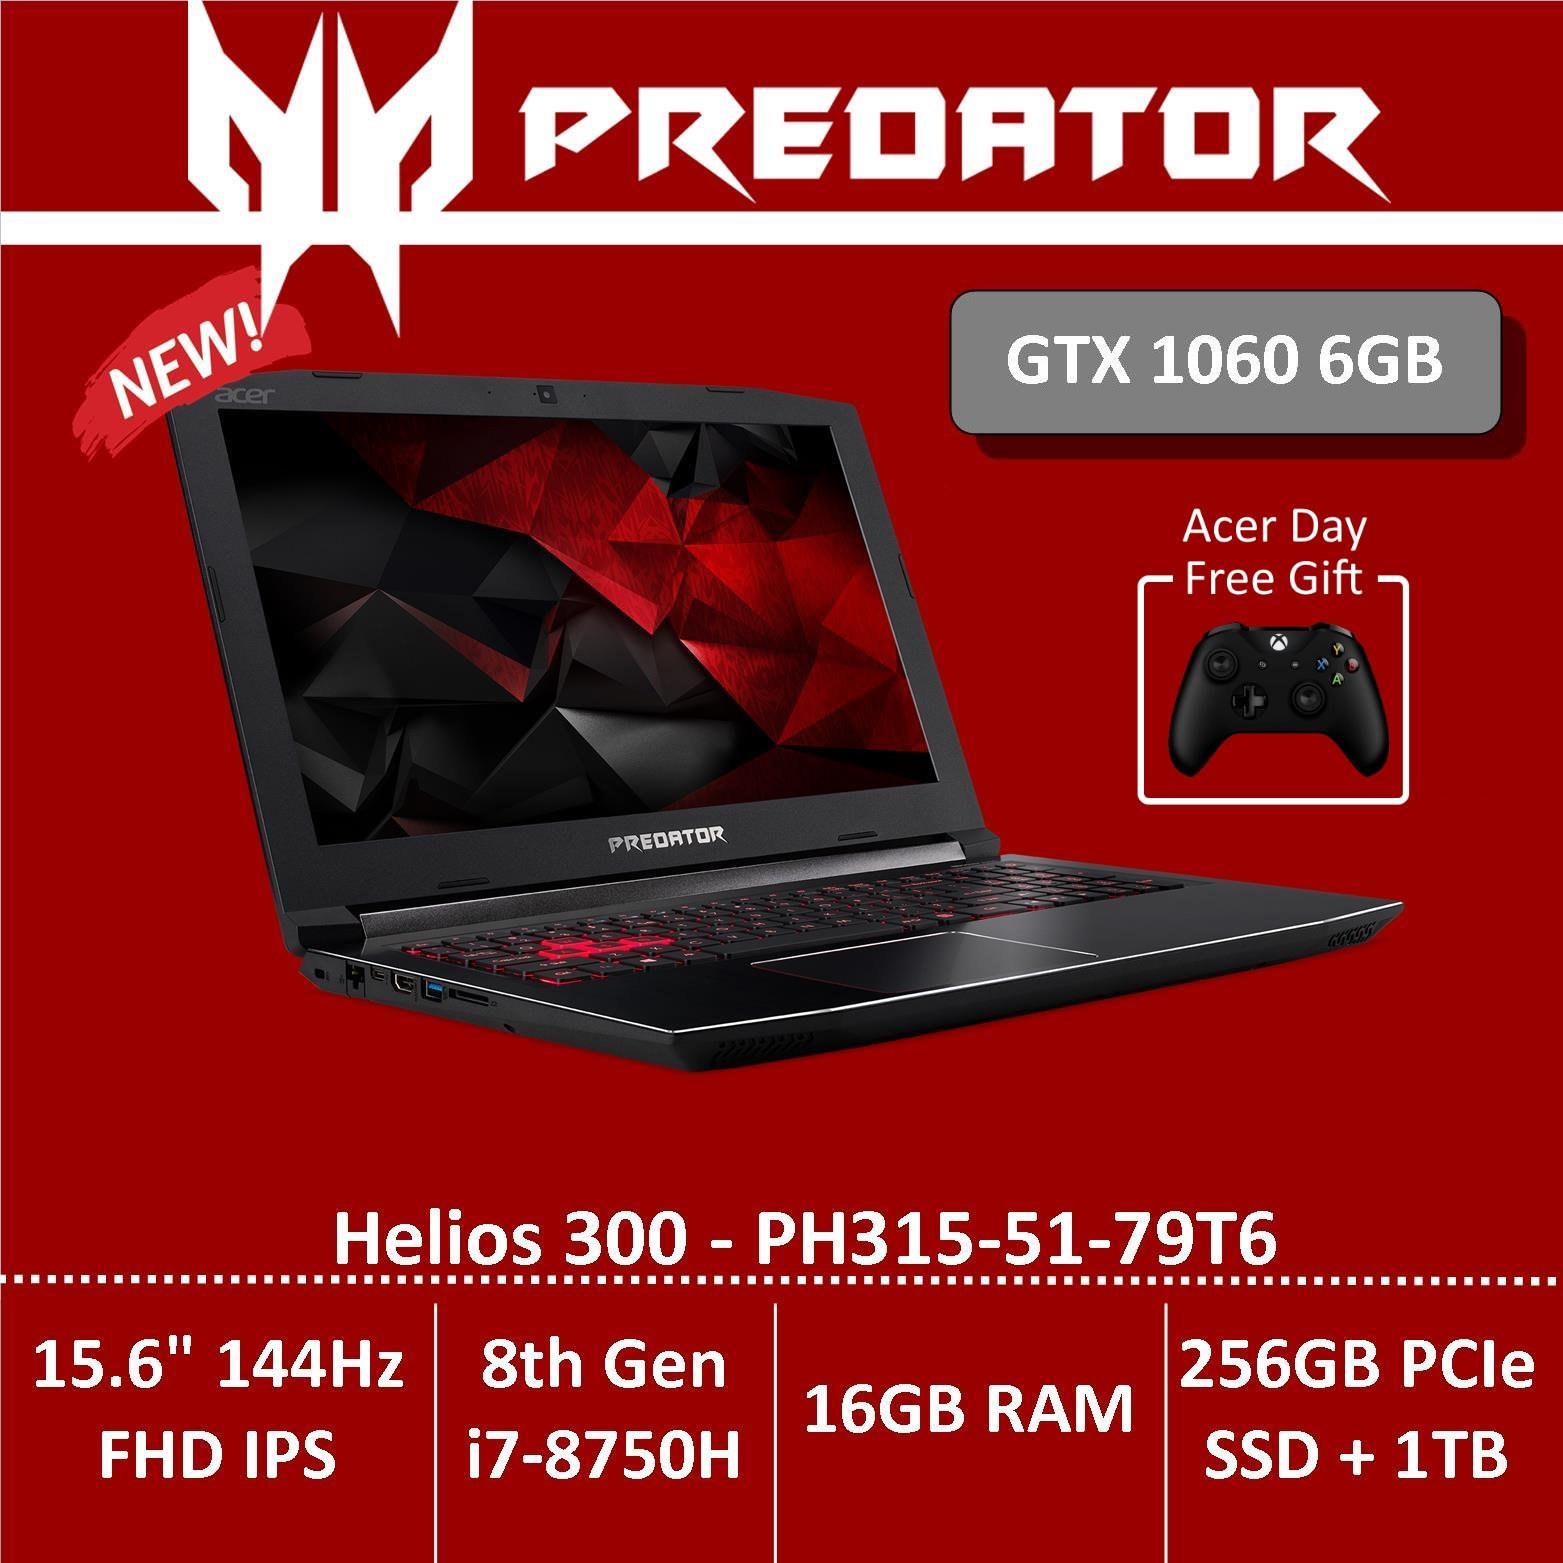 Predator Helios 300 PH315-51-79T6 Gaming Laptop with GTX1060 Graphics – Free Xbox Wireless Controller